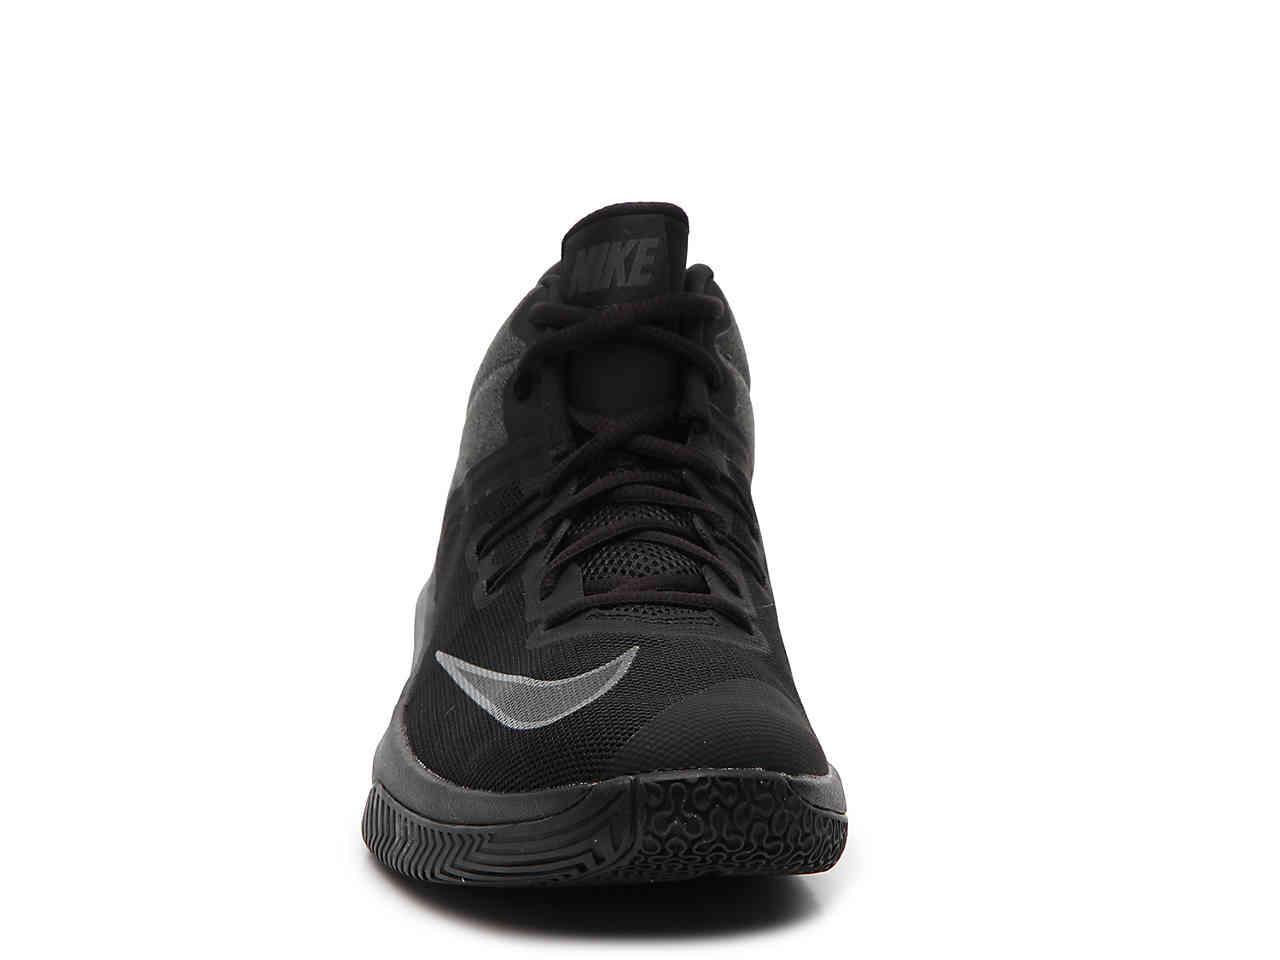 71a218a84081c uk mizuno running shoes women clearance d15f2 69ec2  germany lyst nike air  max versatile running shoe in black for men 07dc7 ec0e0